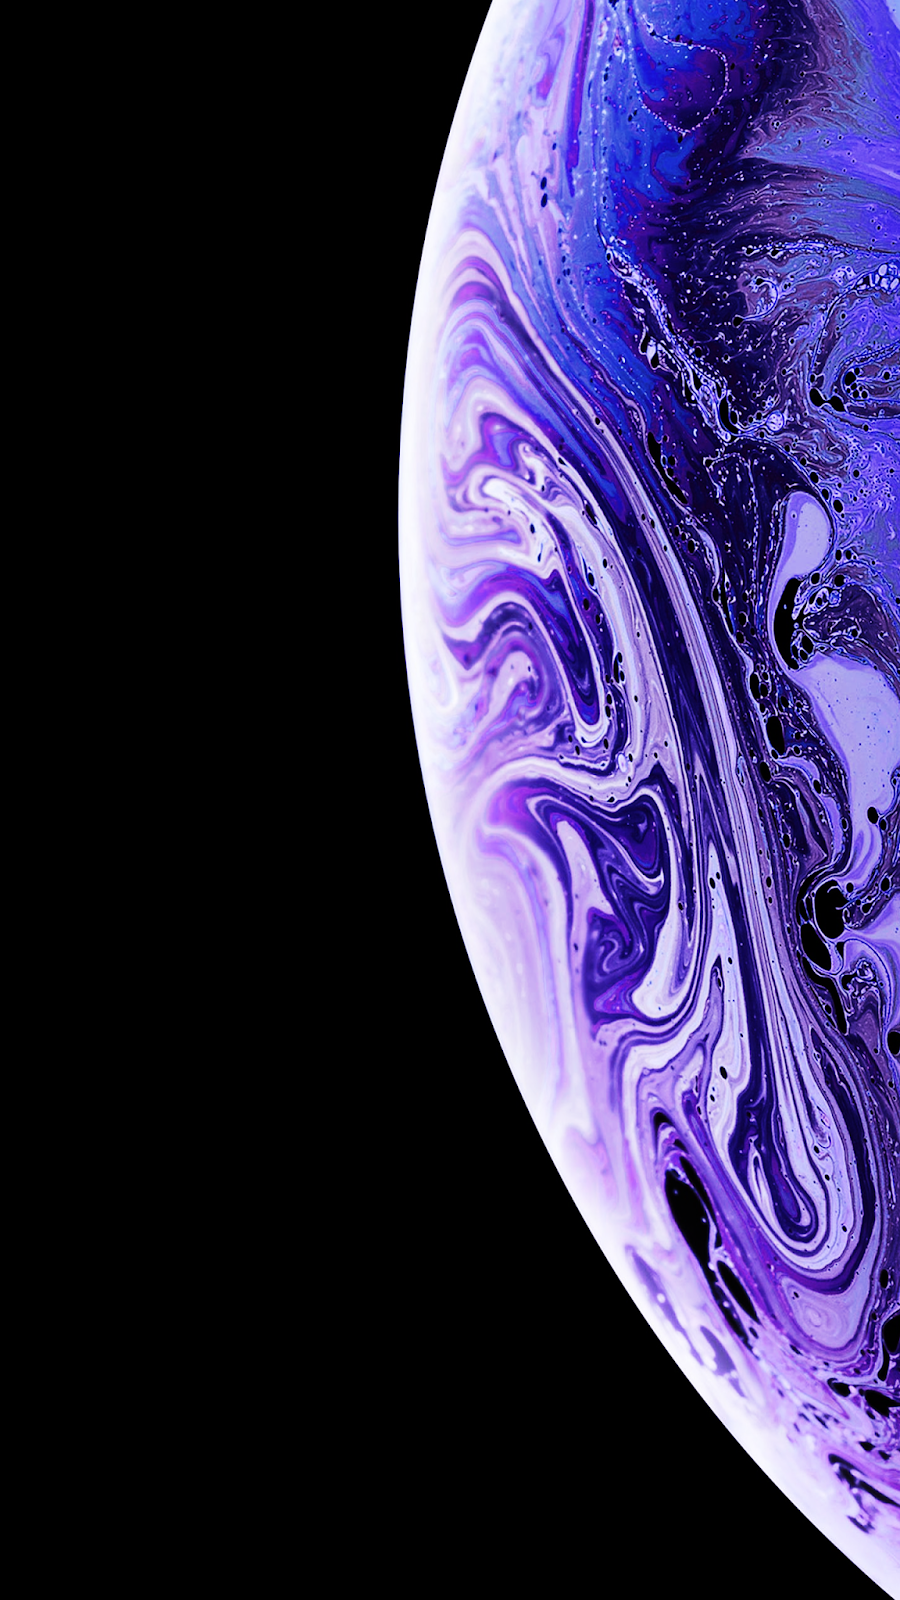 Iphone X Wallpaper Planet Hd